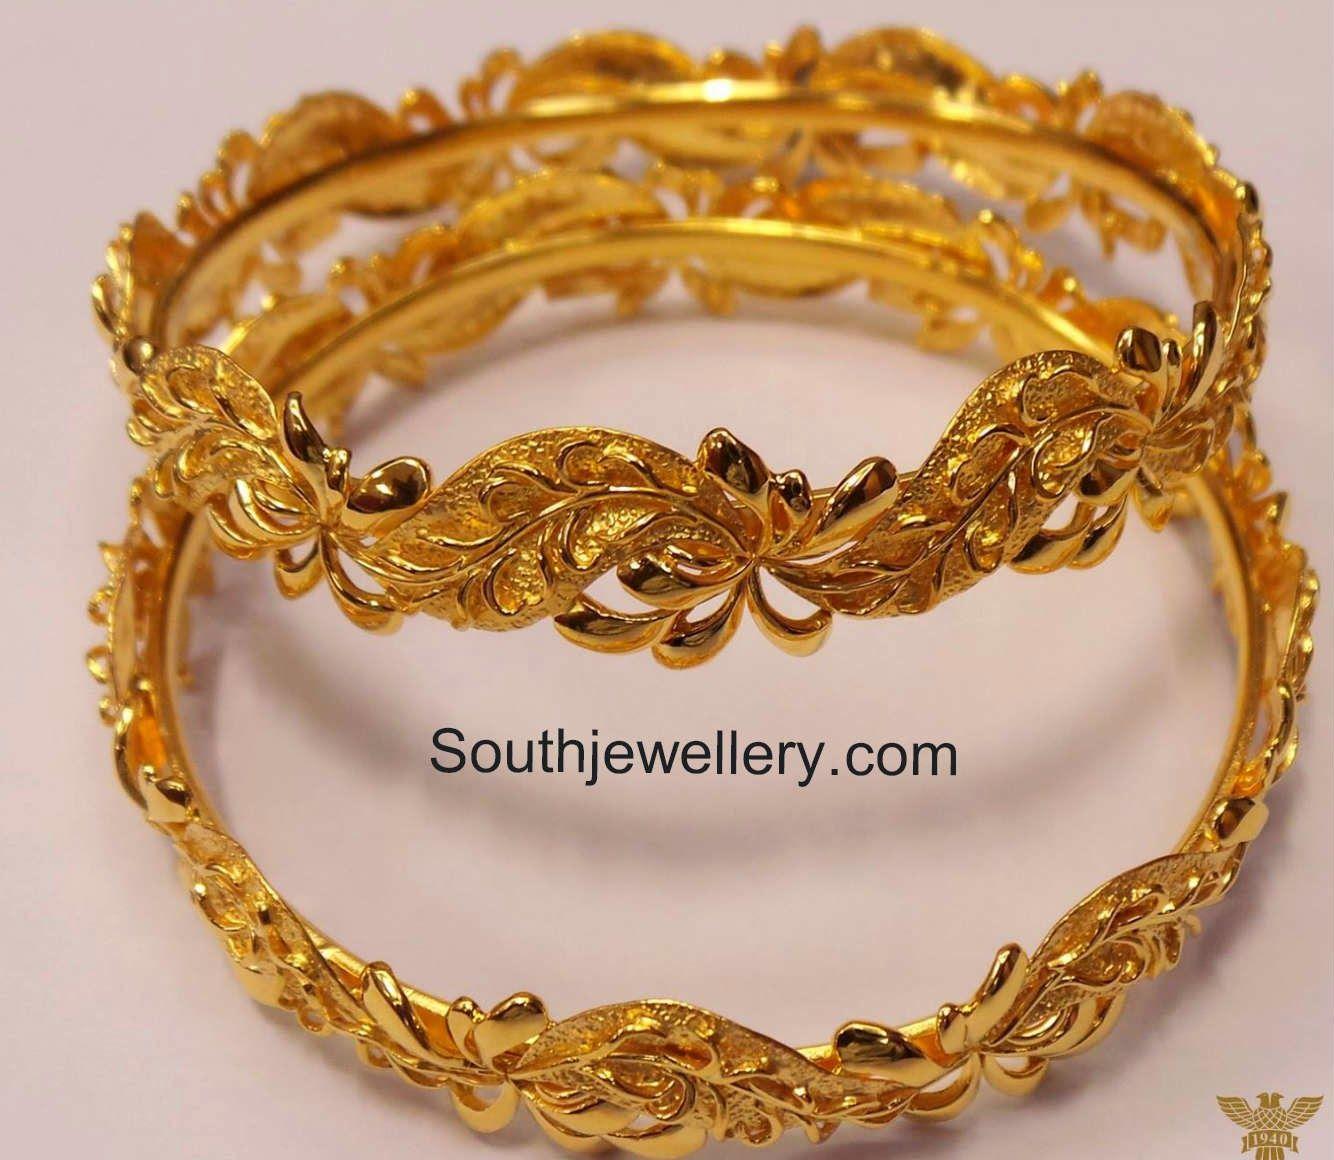 latest plain gold bangles designs | Cute things | Pinterest | Gold ...